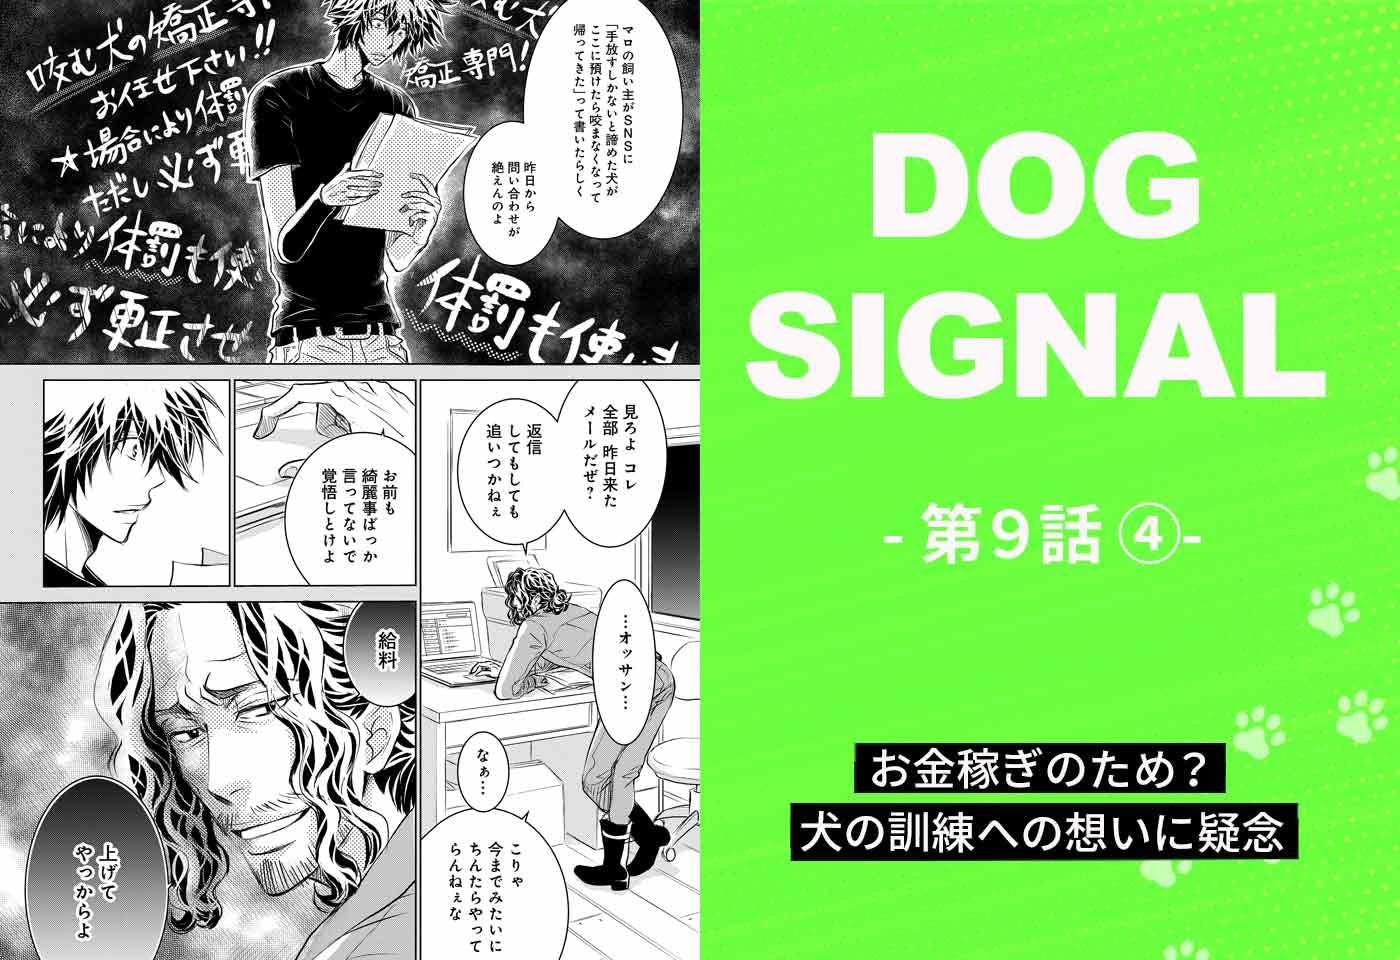 『DOG SIGNAL』9話目 4/4